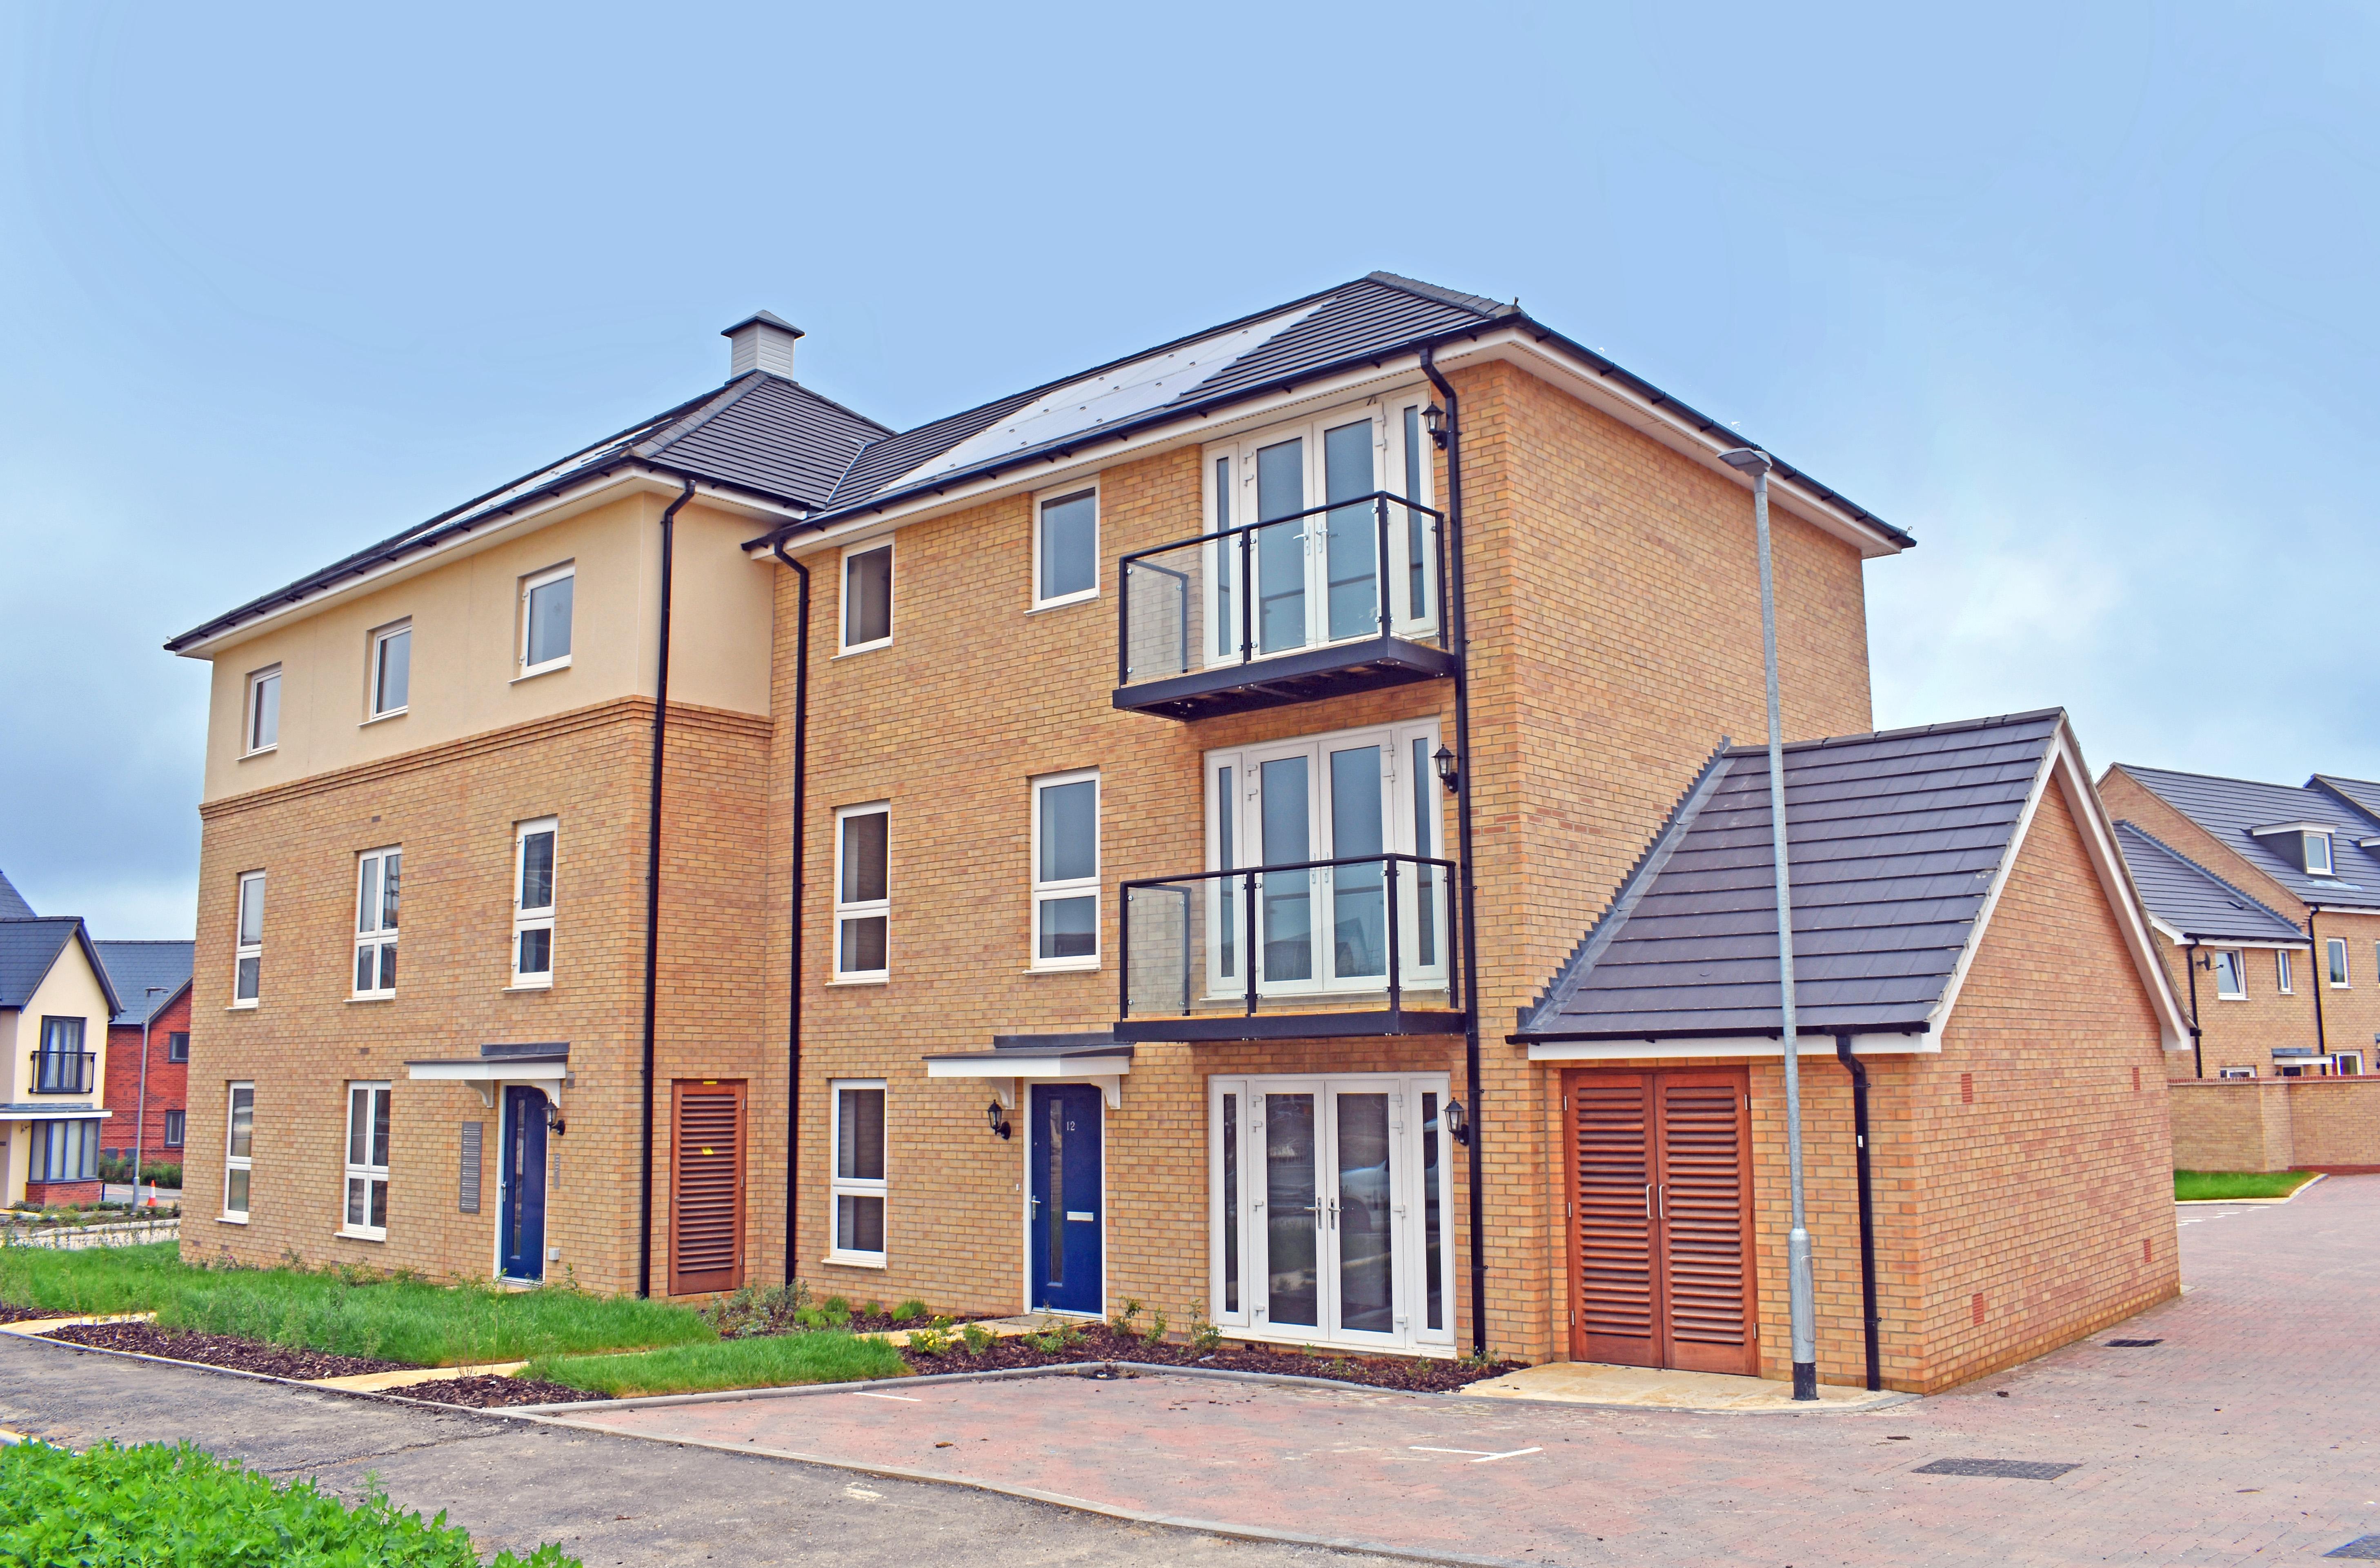 Flat 5, 19 Angus Way , Milton Keynes , Buckinghamshire Image